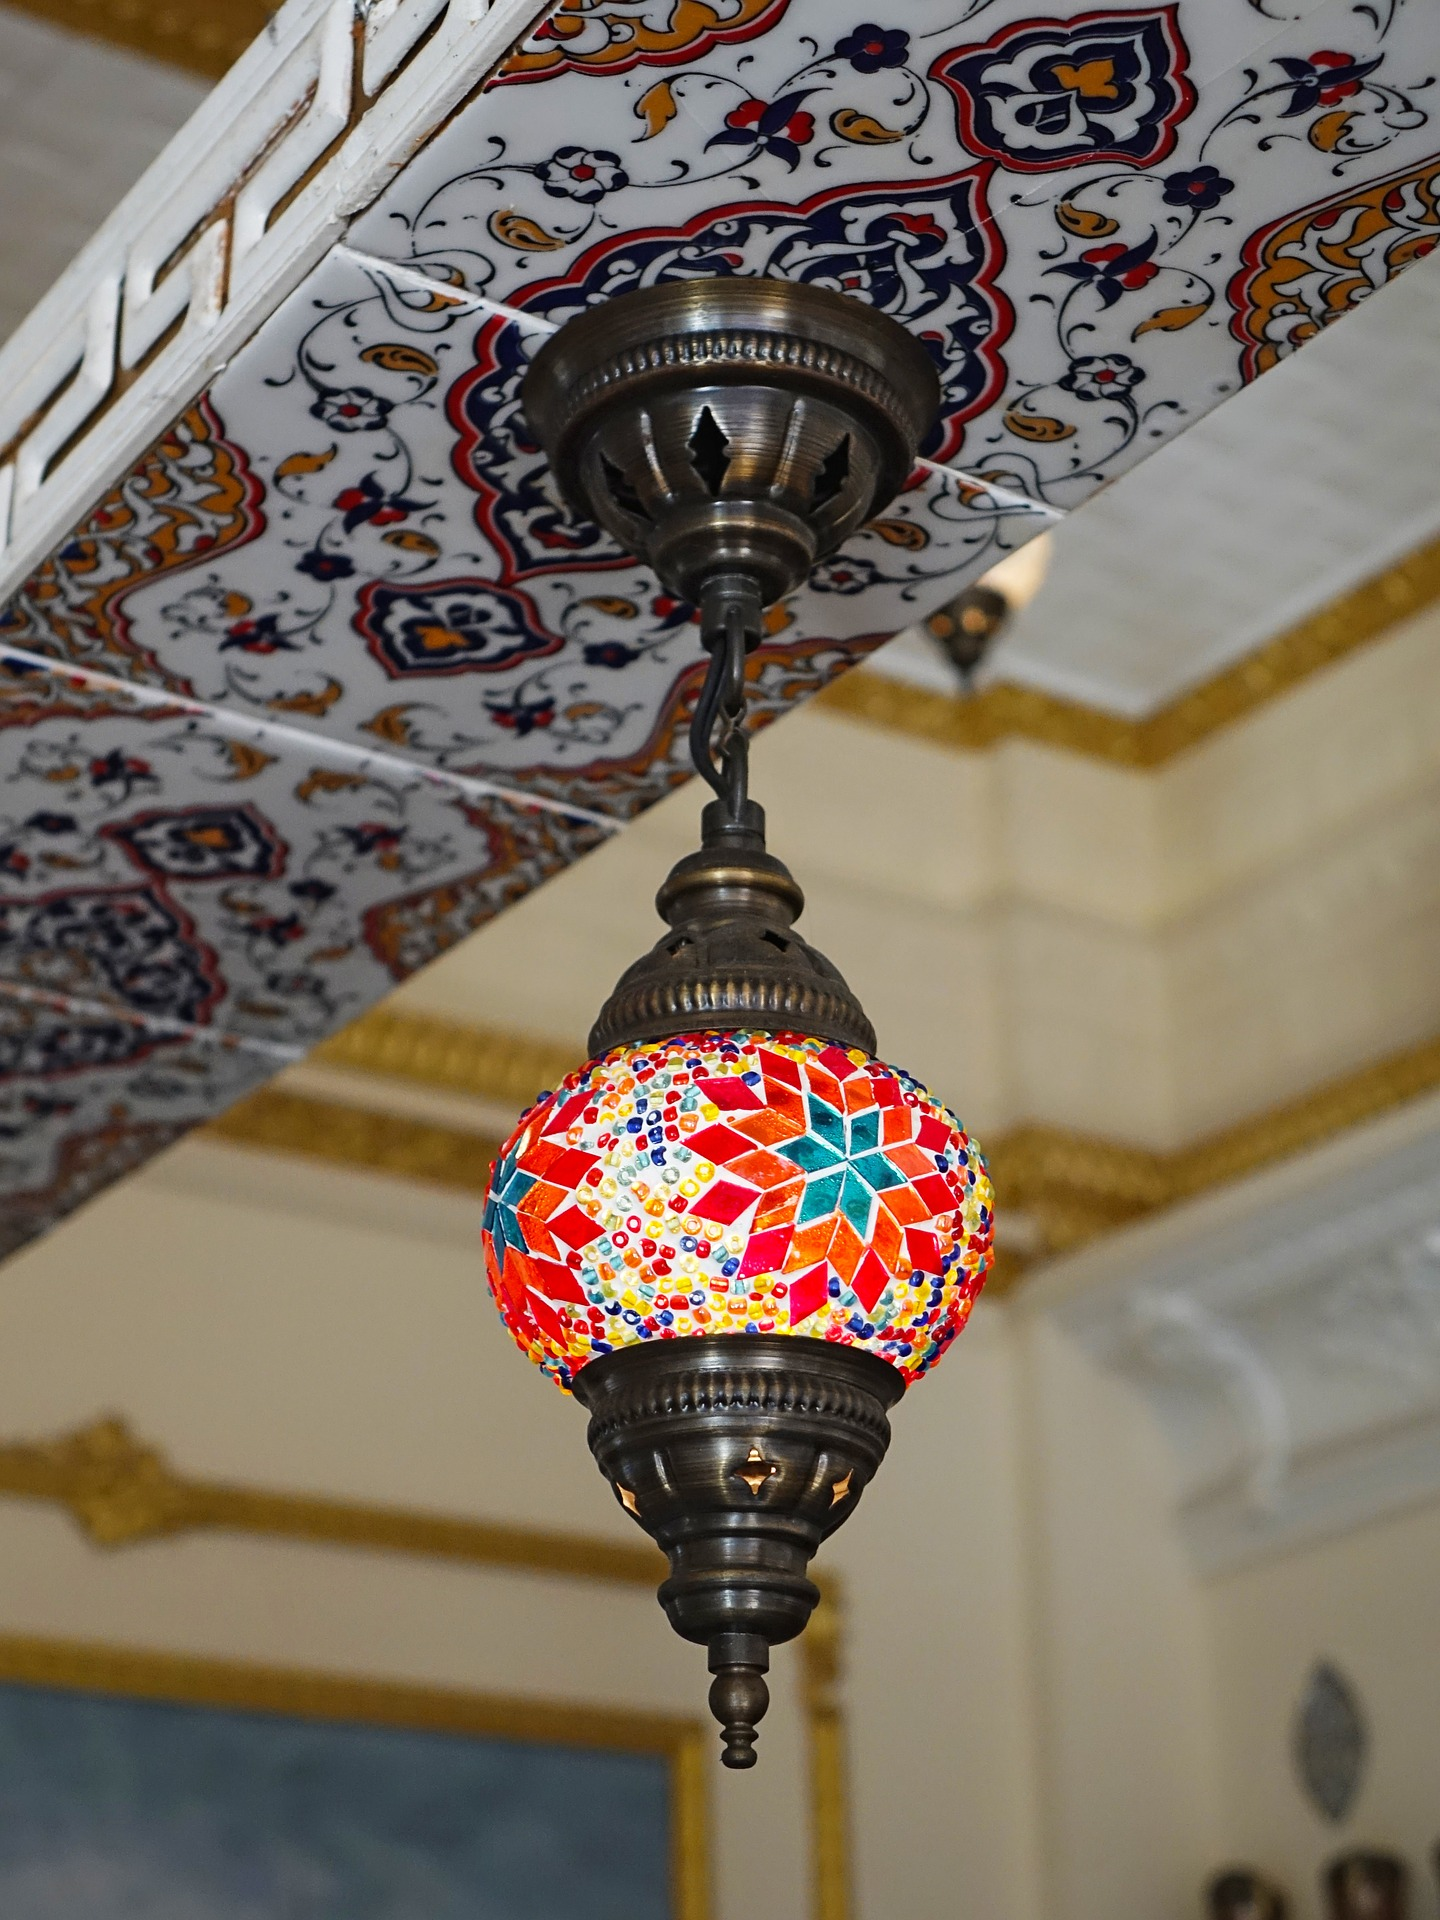 Morrocan Design, Design, Lamp, Lantern, Light, HQ Photo